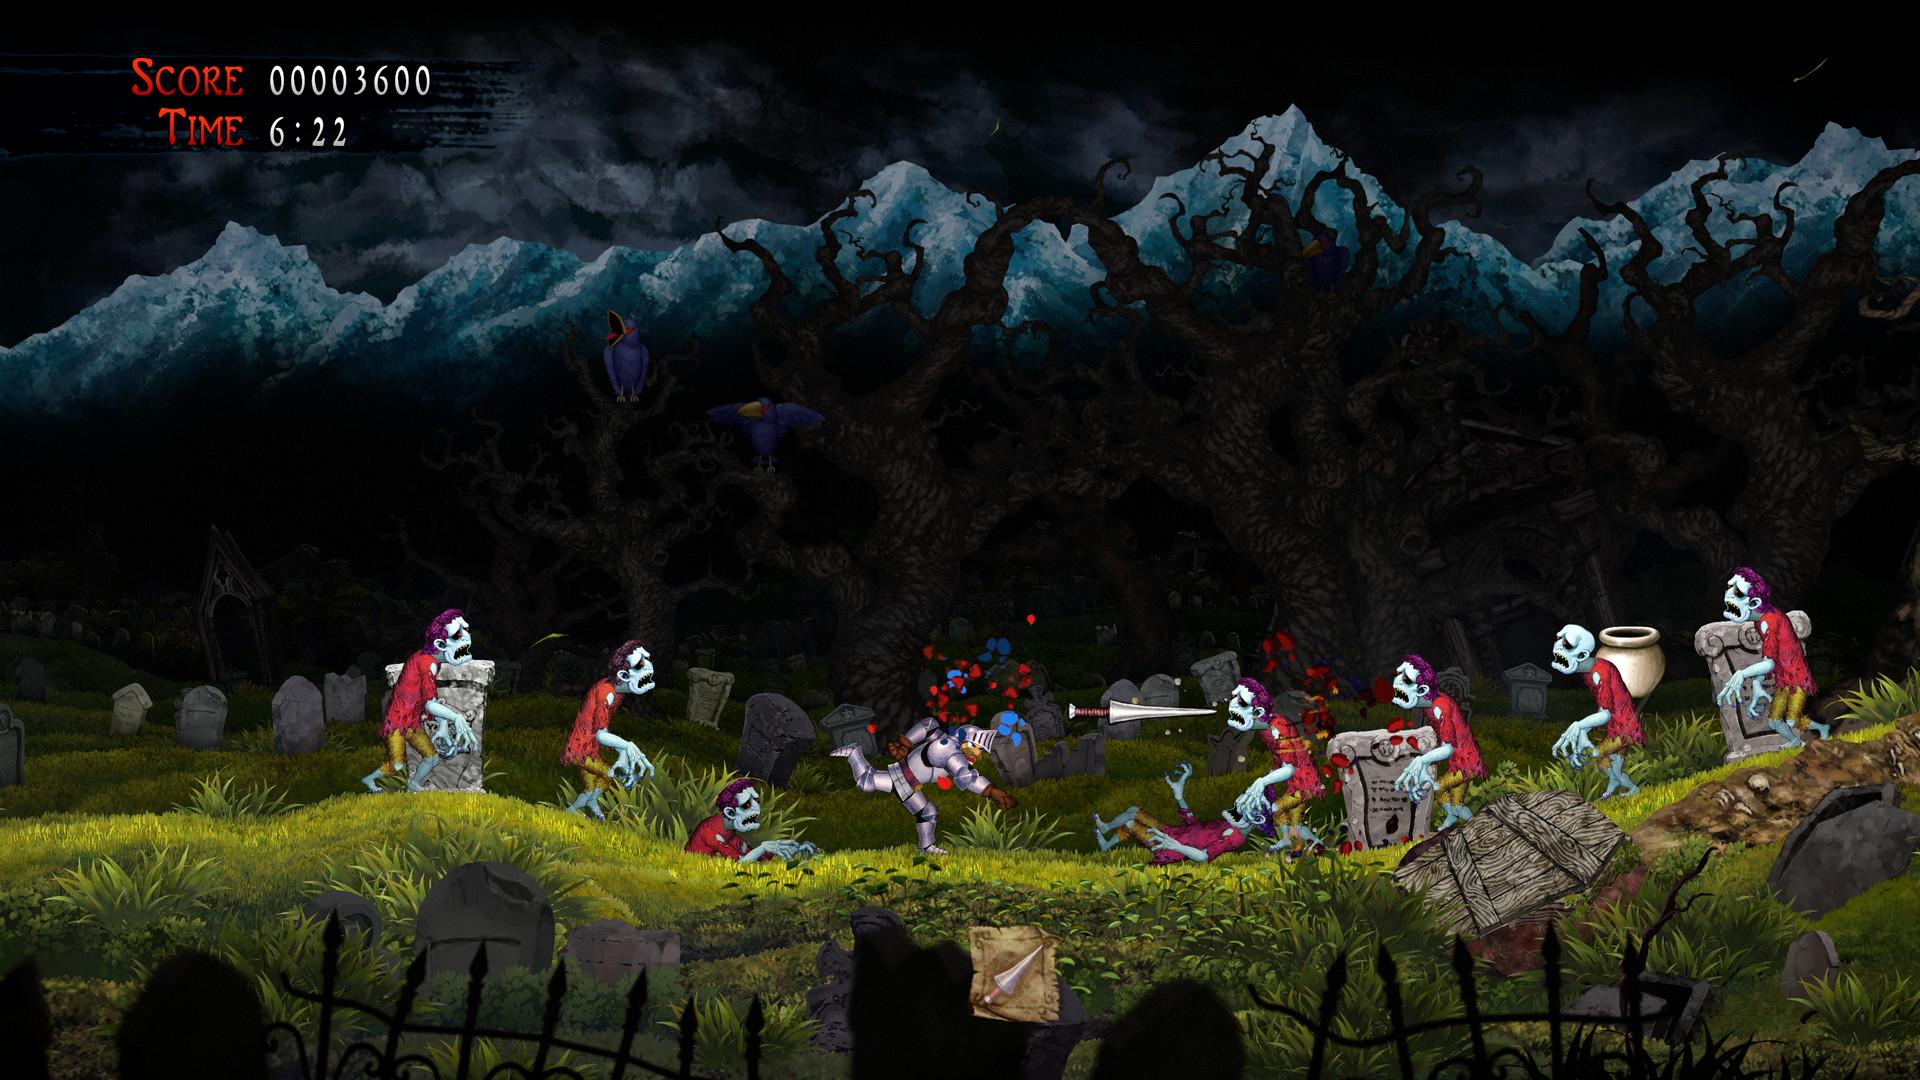 经典回归 魔界村-重制版/Ghosts n Goblins Resurrection(Build.6580247+预约特典)插图3